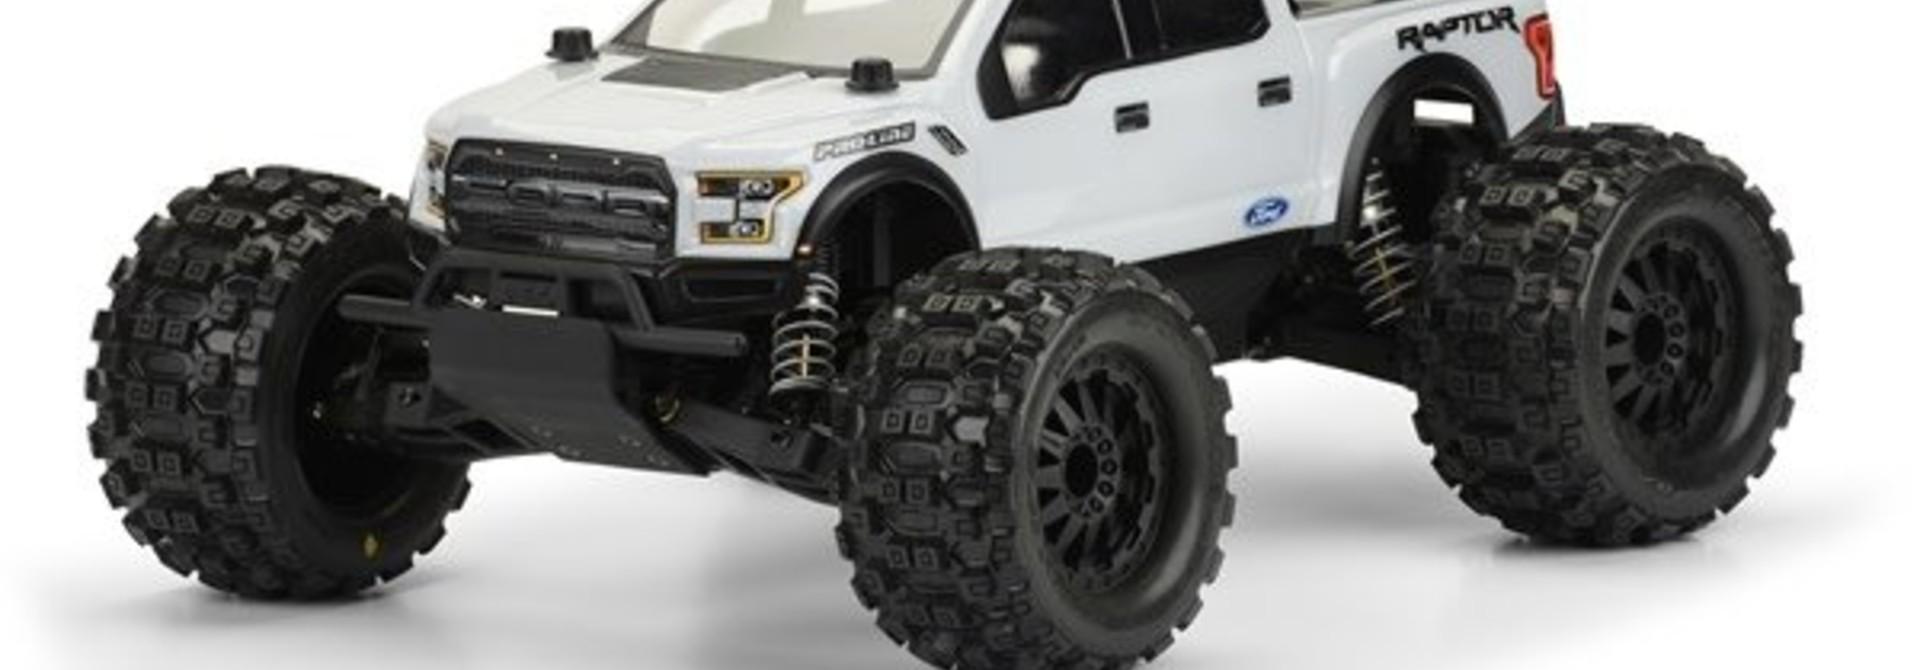 2017 Ford F-150 Raptor Clear Body for PRO-MT, PR3471-00